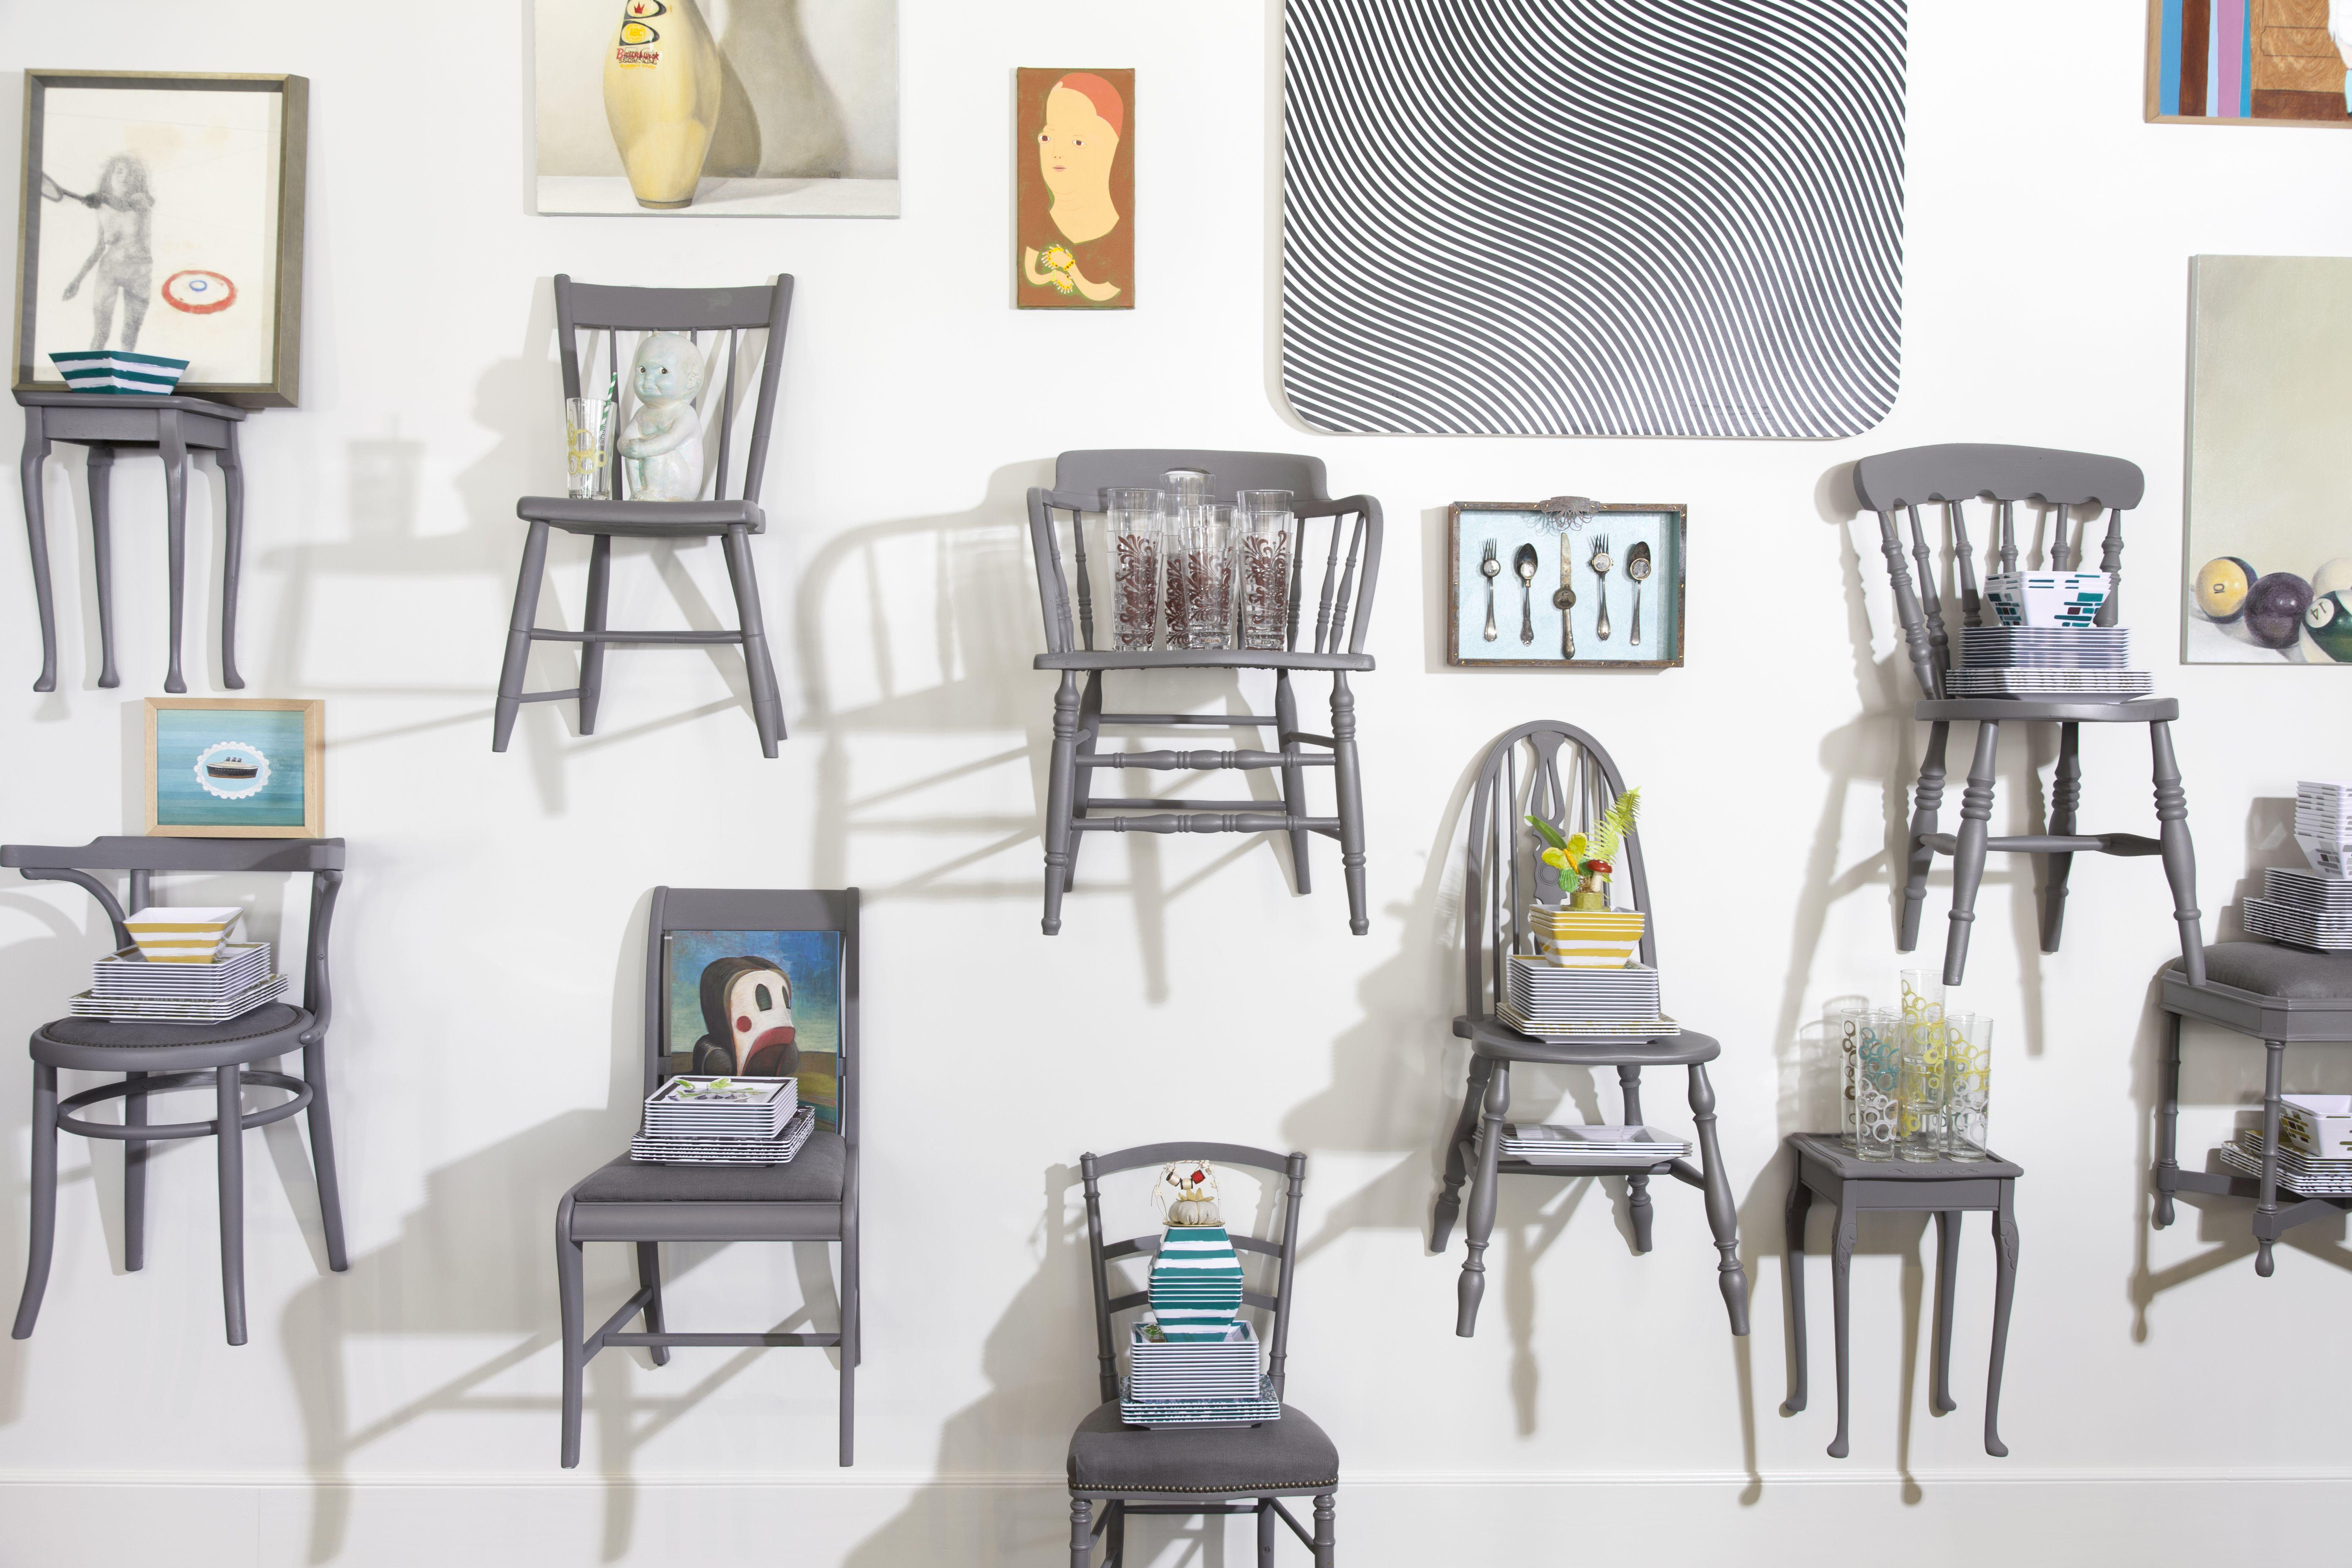 #glennewallace #retail #retaildesign #storedesign #scaddesigngroup chair wall @shopSCAD www.shopscad.com #merchandising #savannahga #chairs